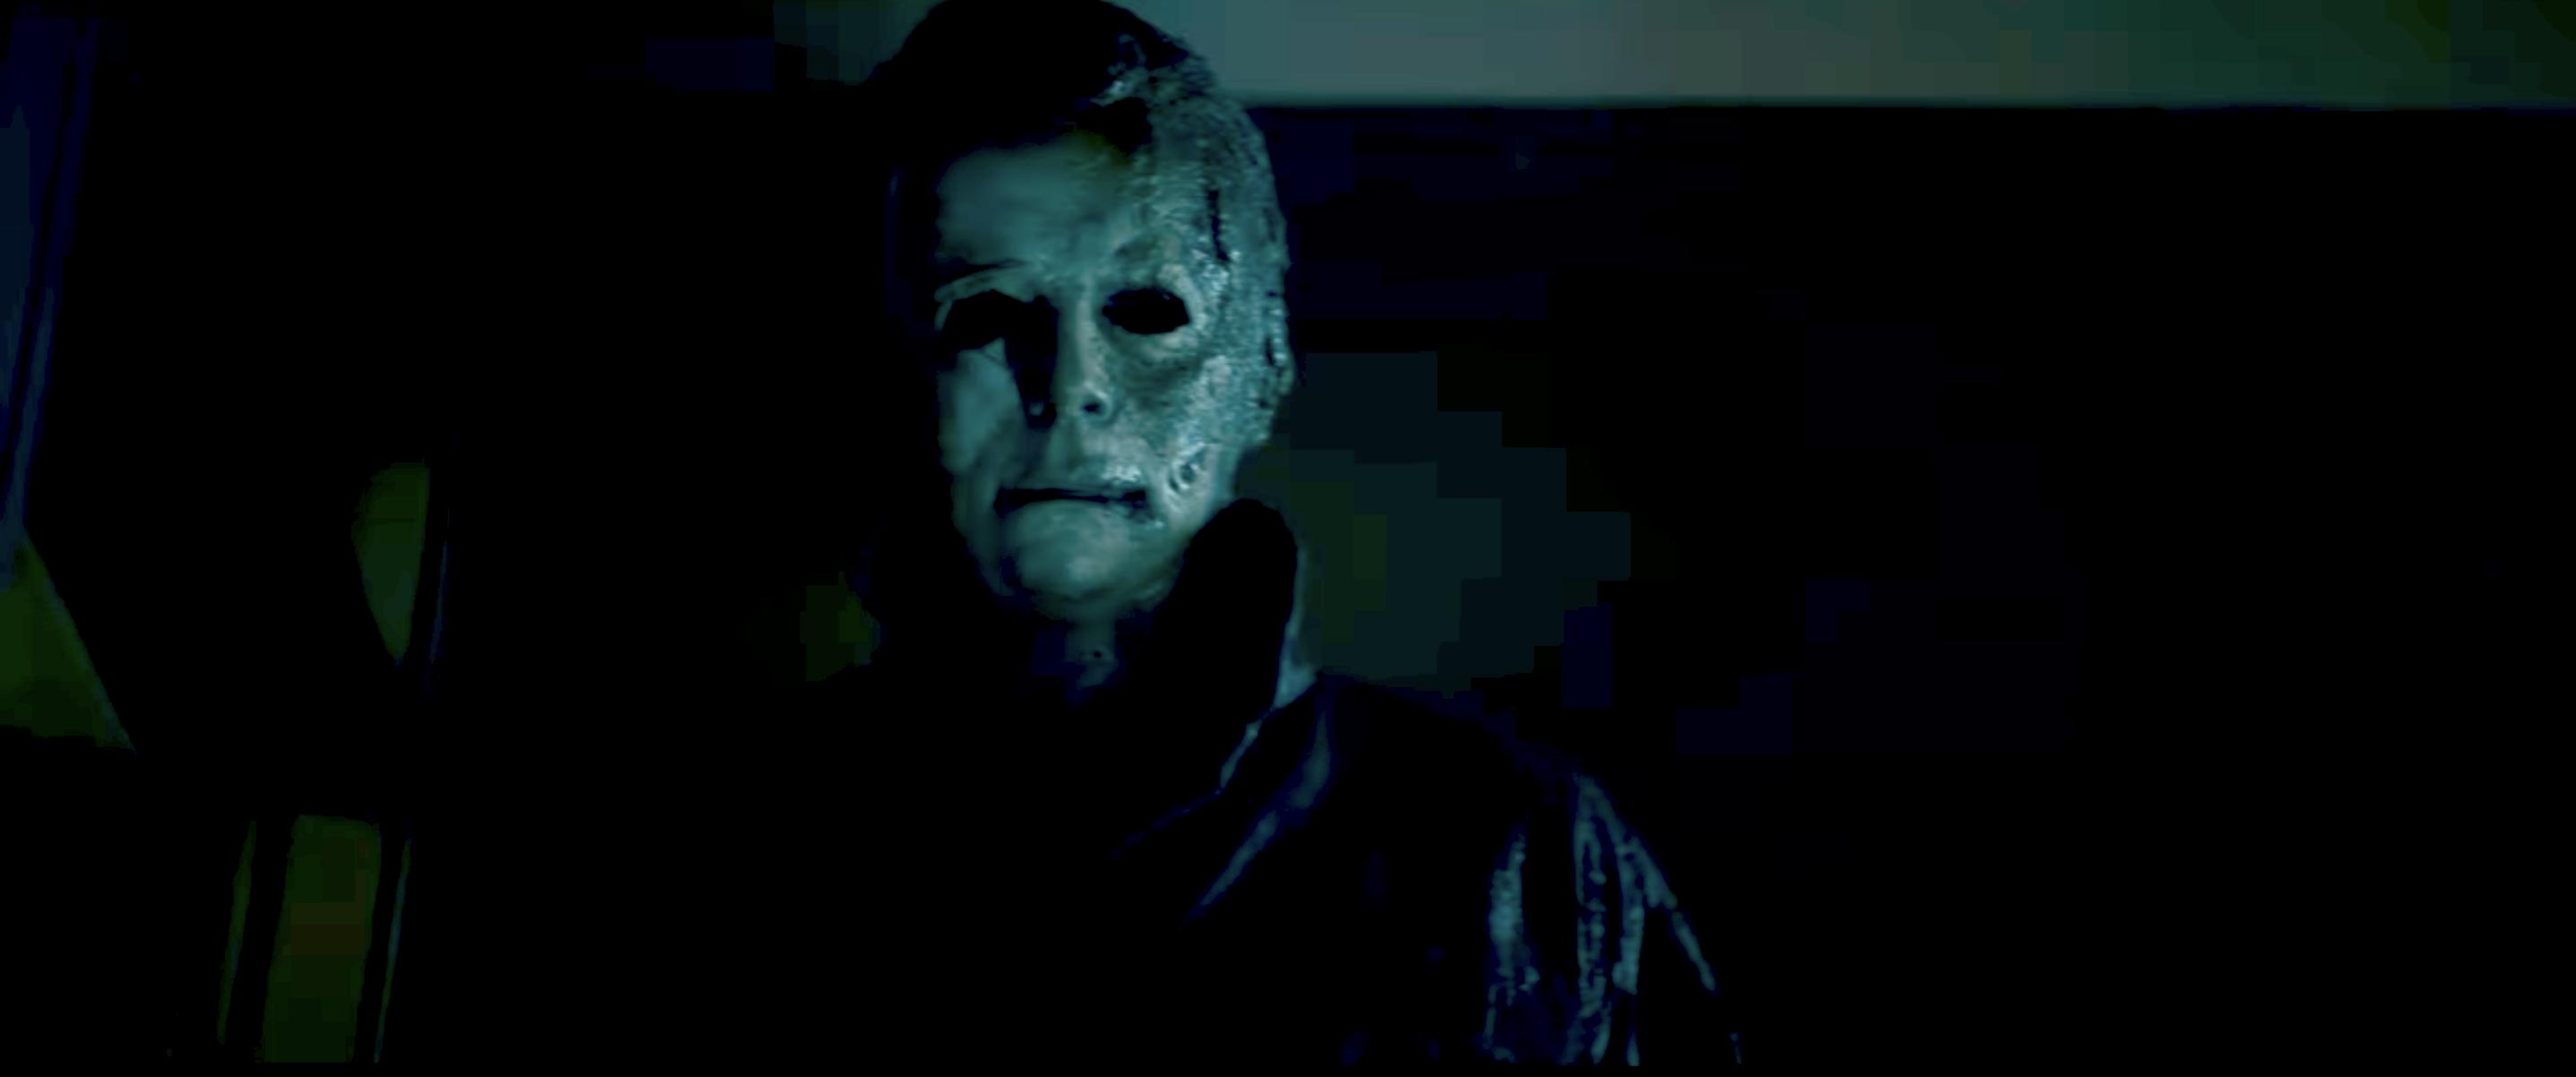 Halloween Kills trailer reveals first look at original characters